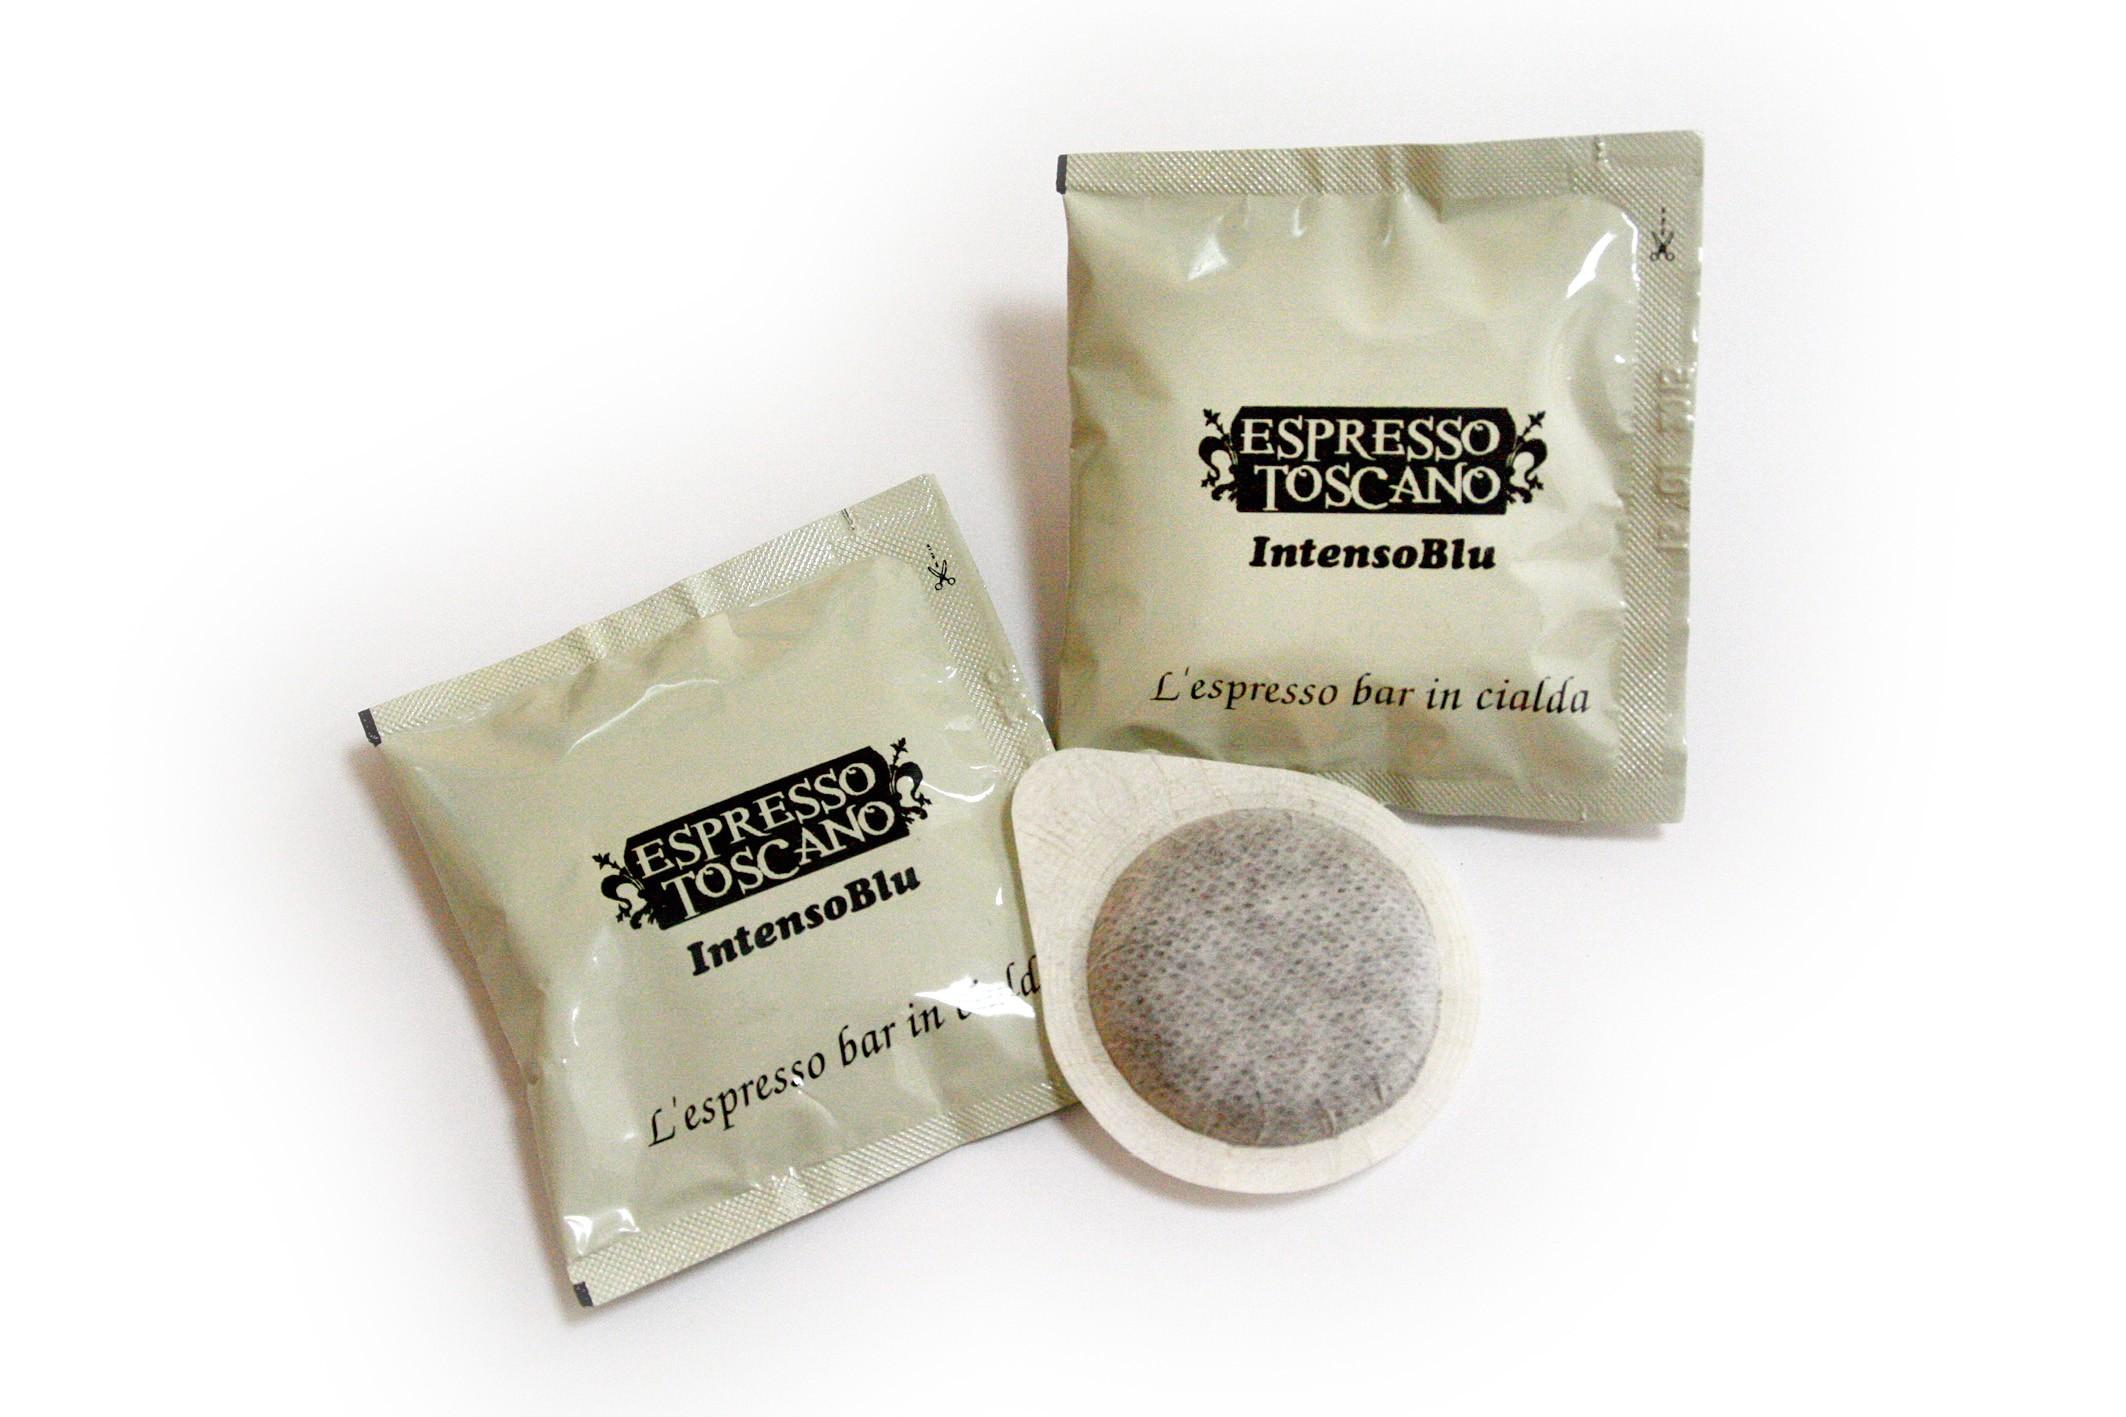 100 cialde filtro carta ESE 44 Espresso Toscano